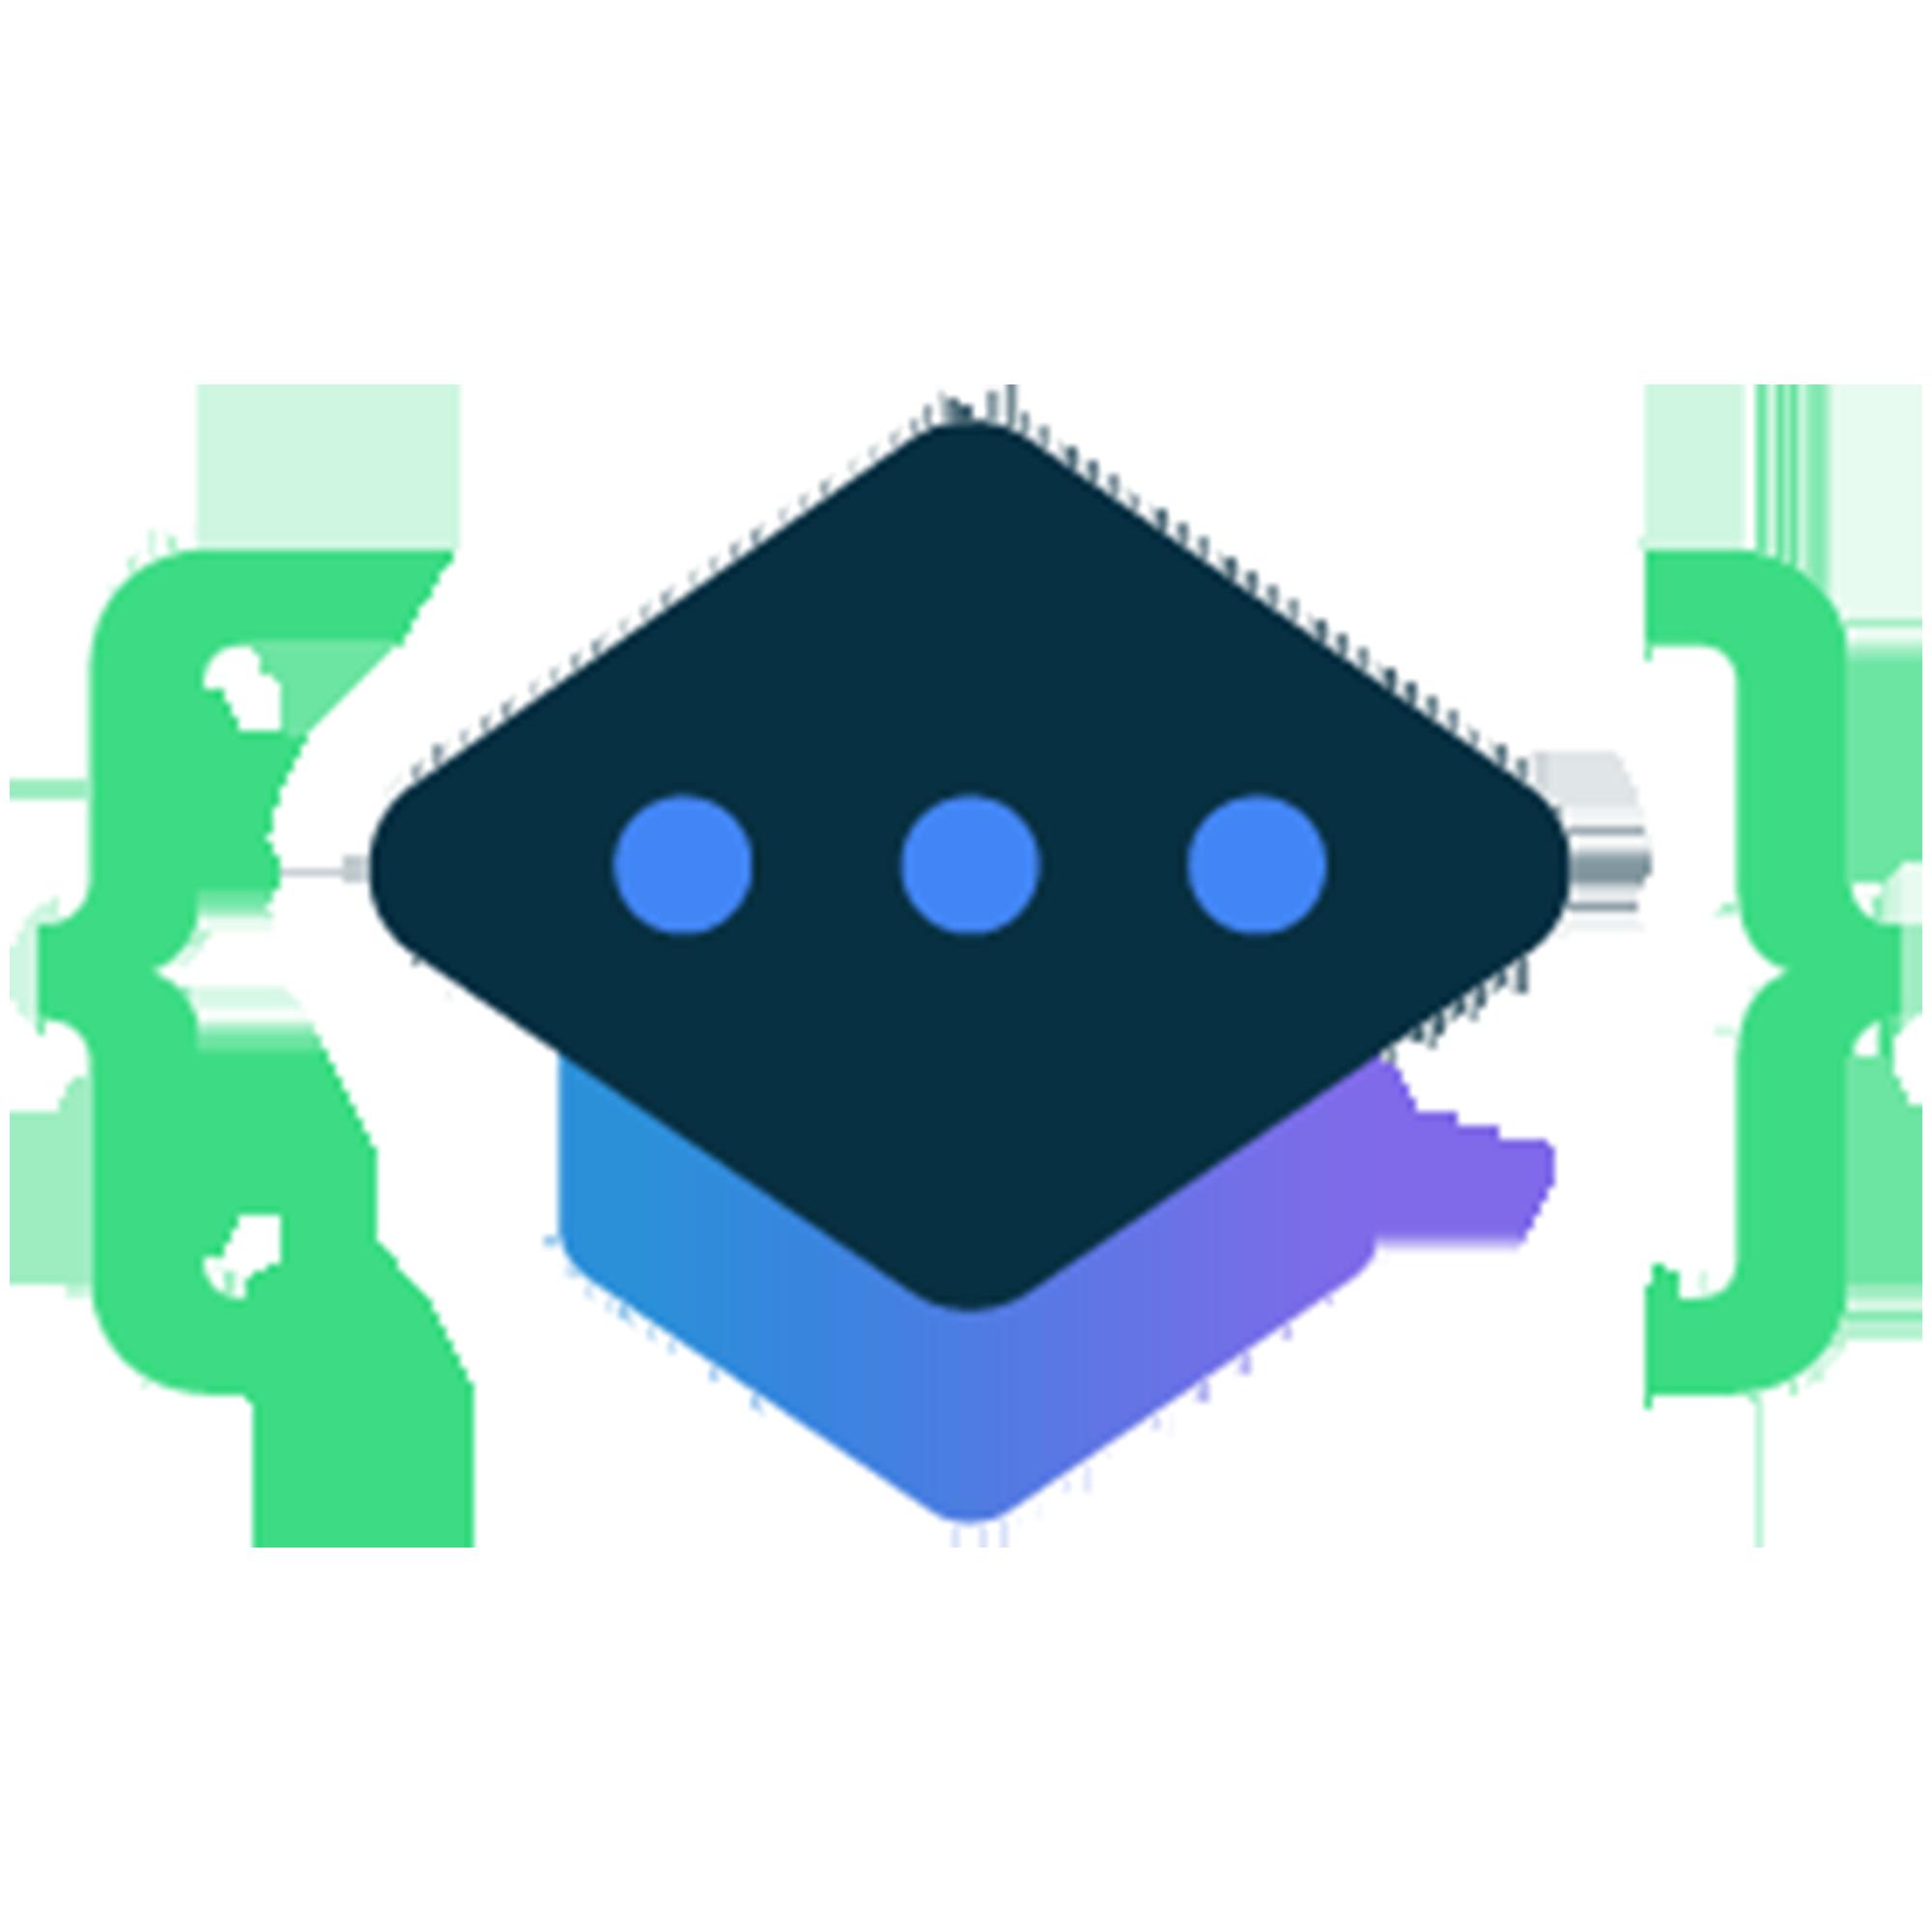 Kotlin extension library codelab image